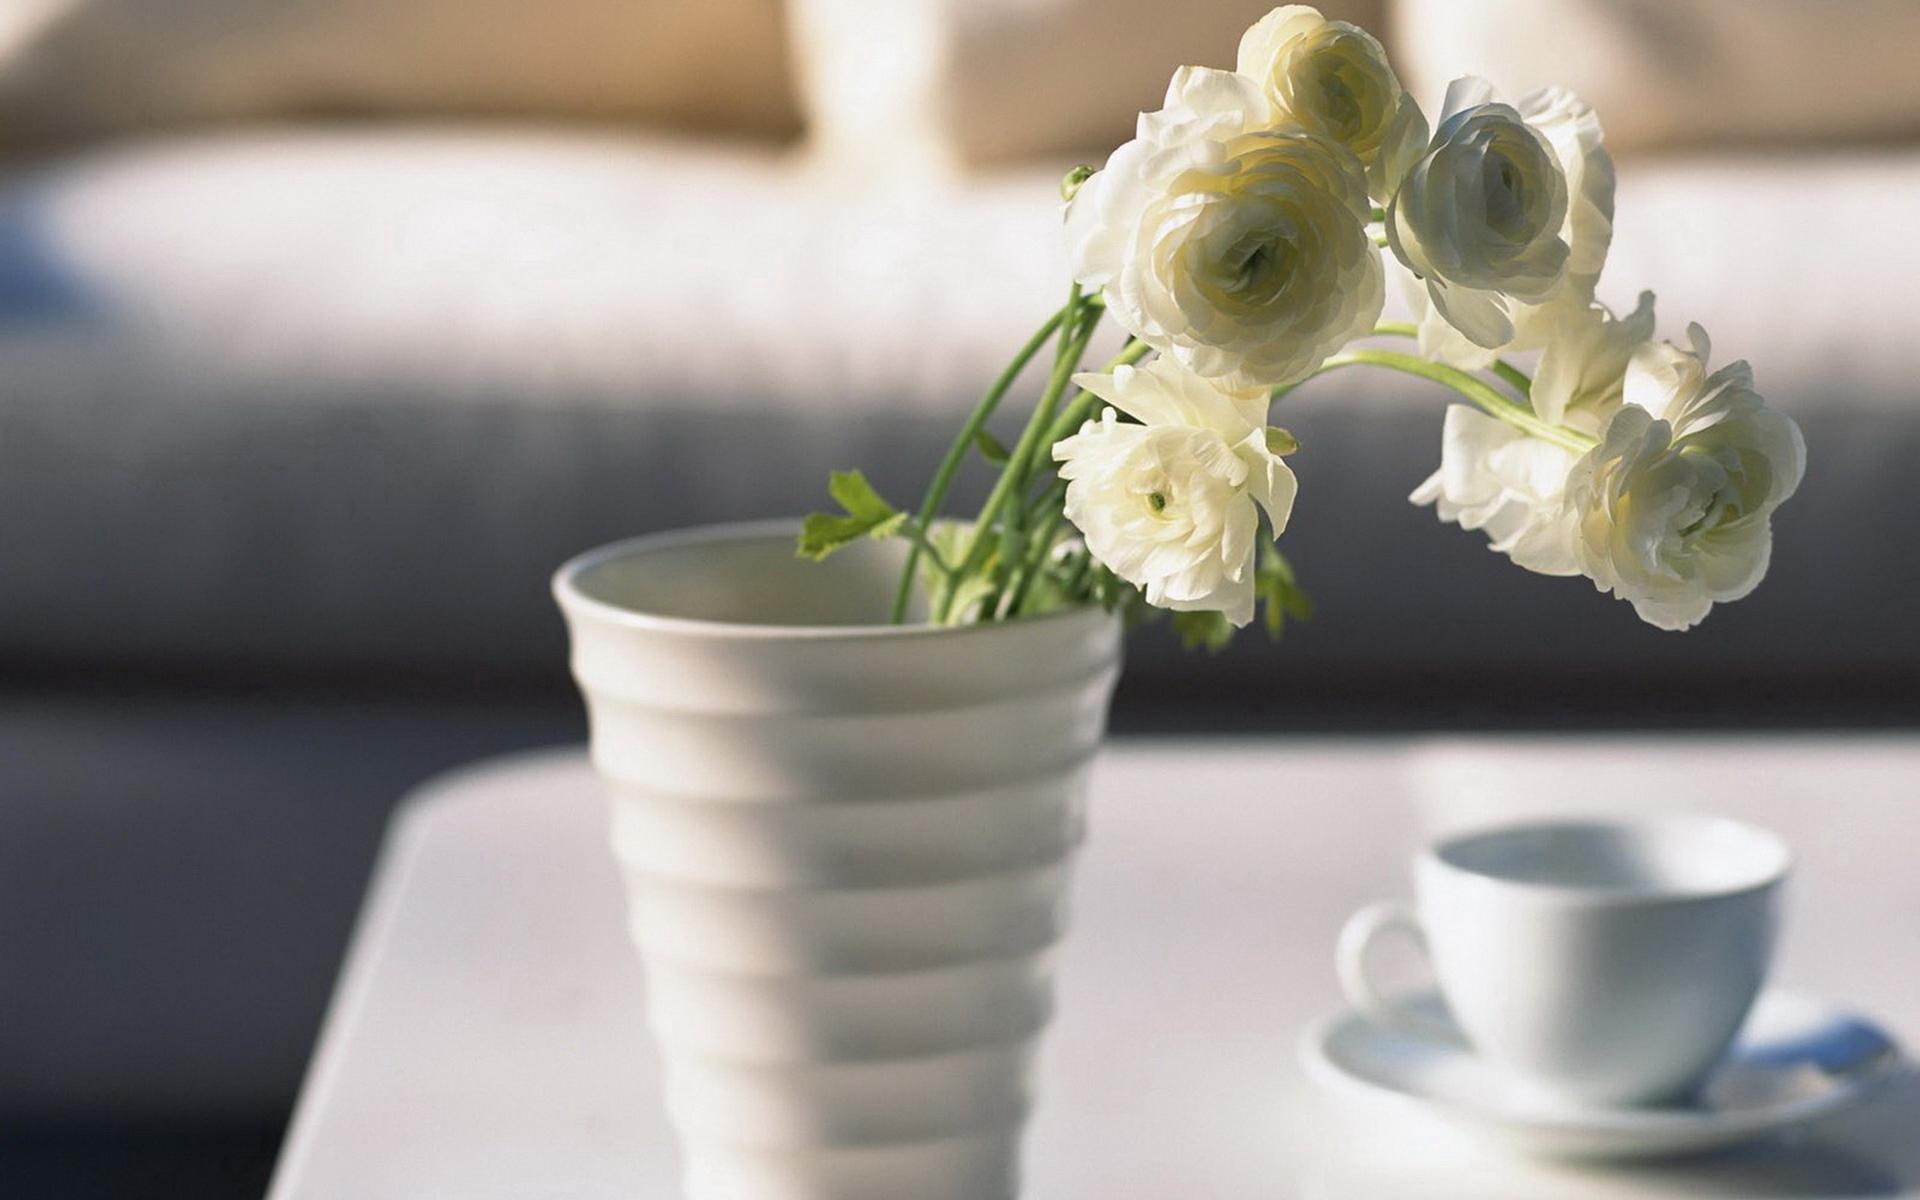 Vase Wallpaper HD Freetopwallpapercom 1920x1200